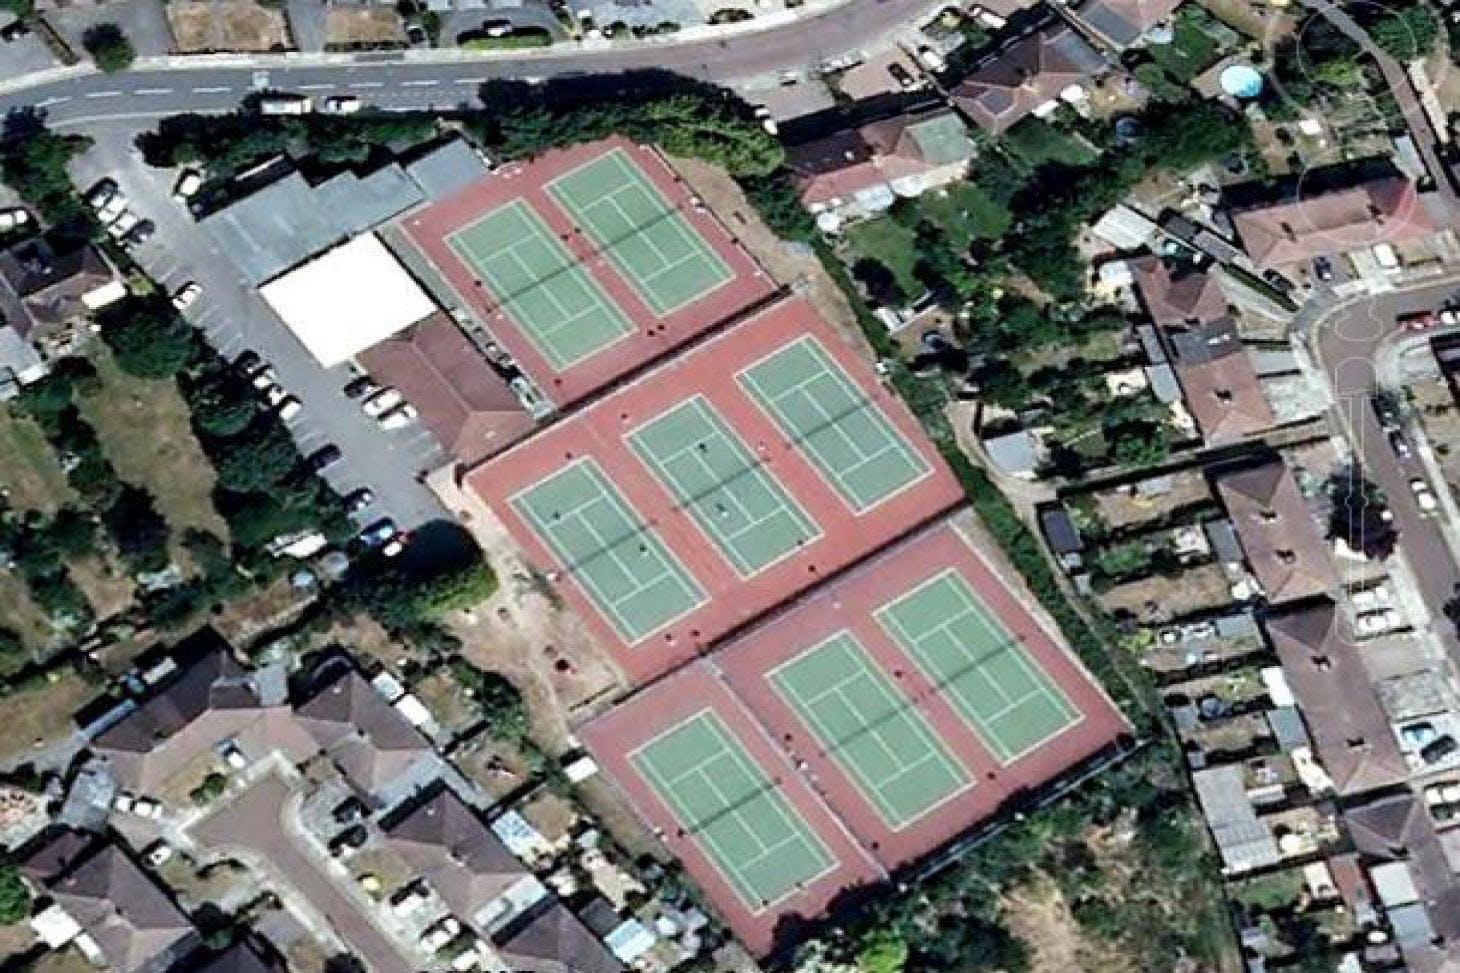 The Bexley Lawn Tennis, Squash & Racketball Club Gym gym